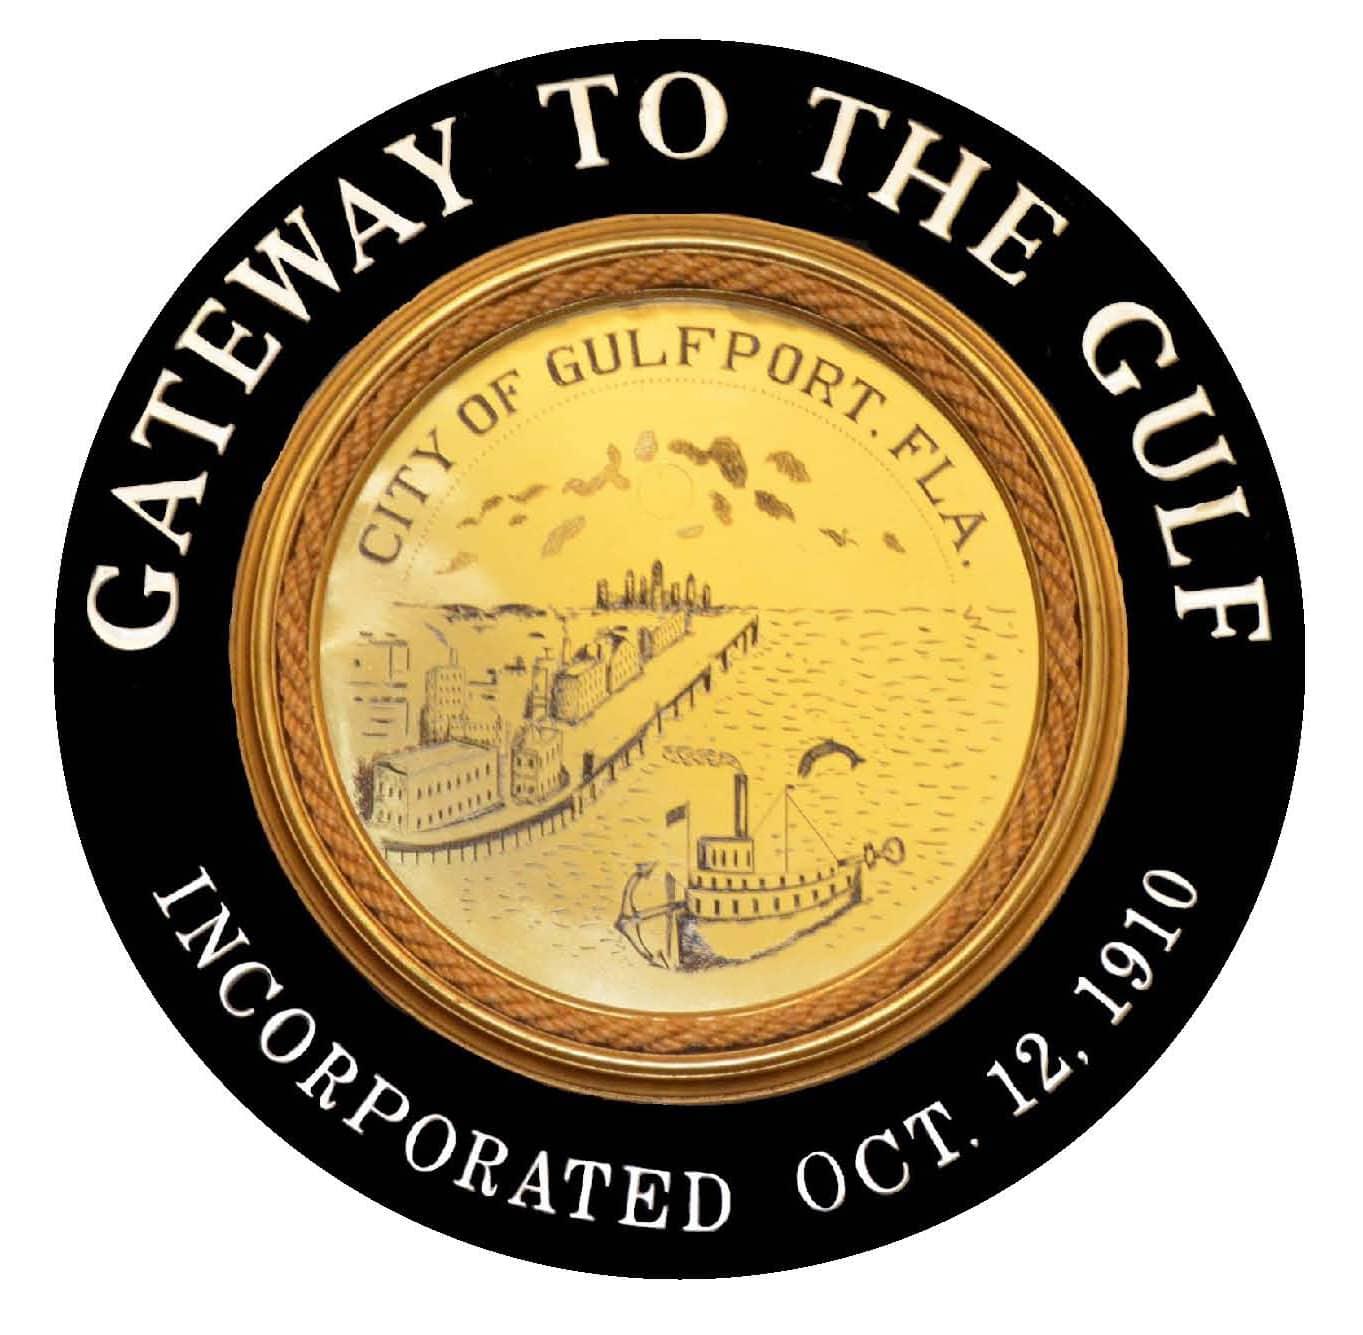 Gulfport Florida City Seal